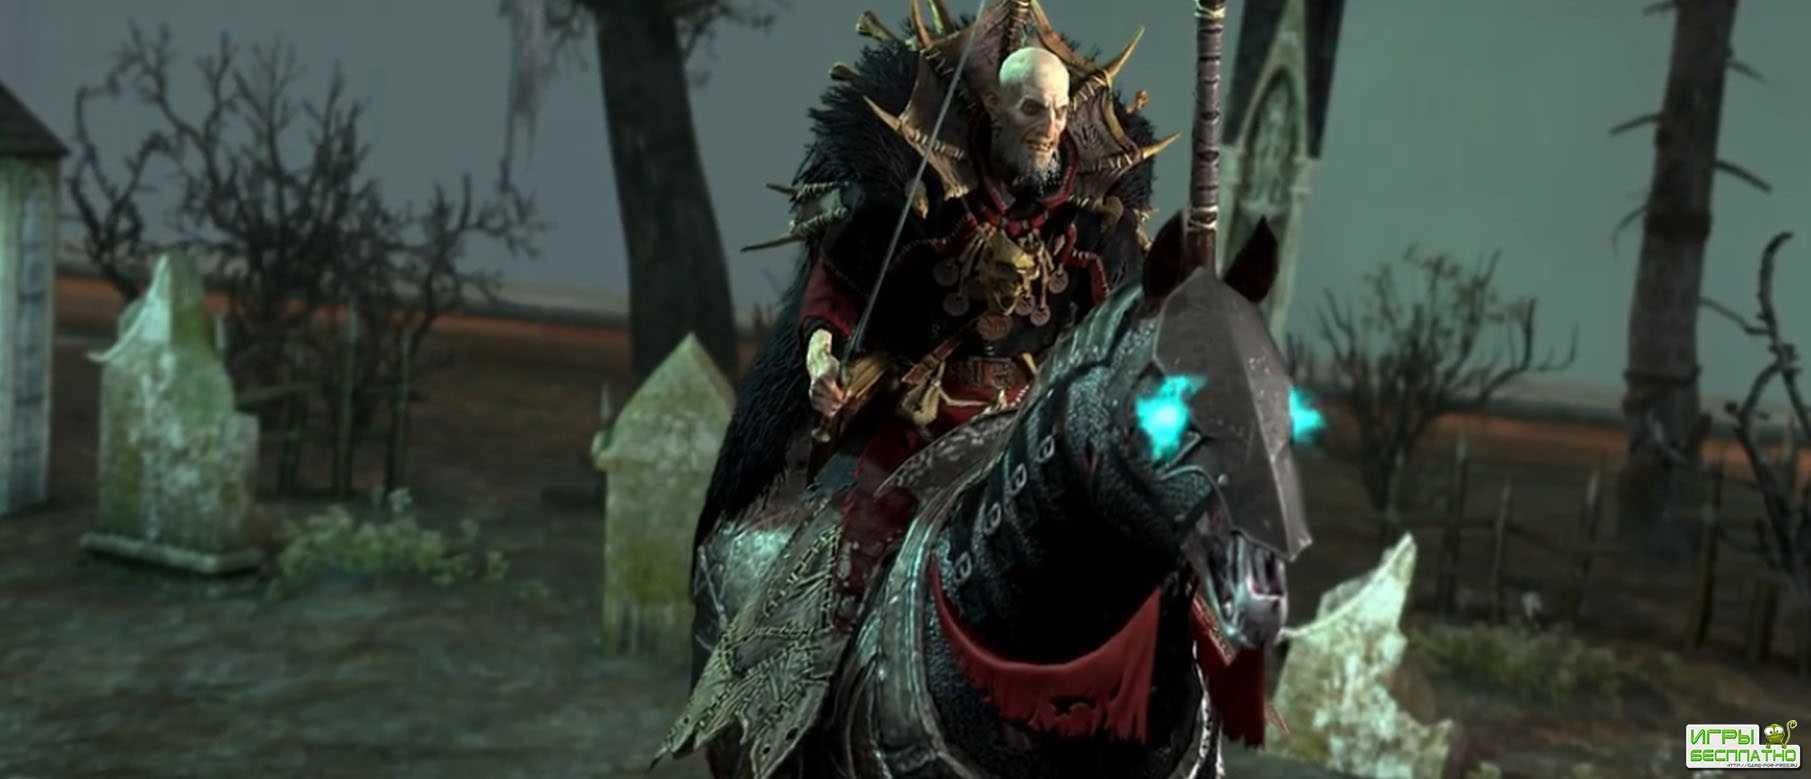 Total War: Warhammer 3 в пре-продакшене